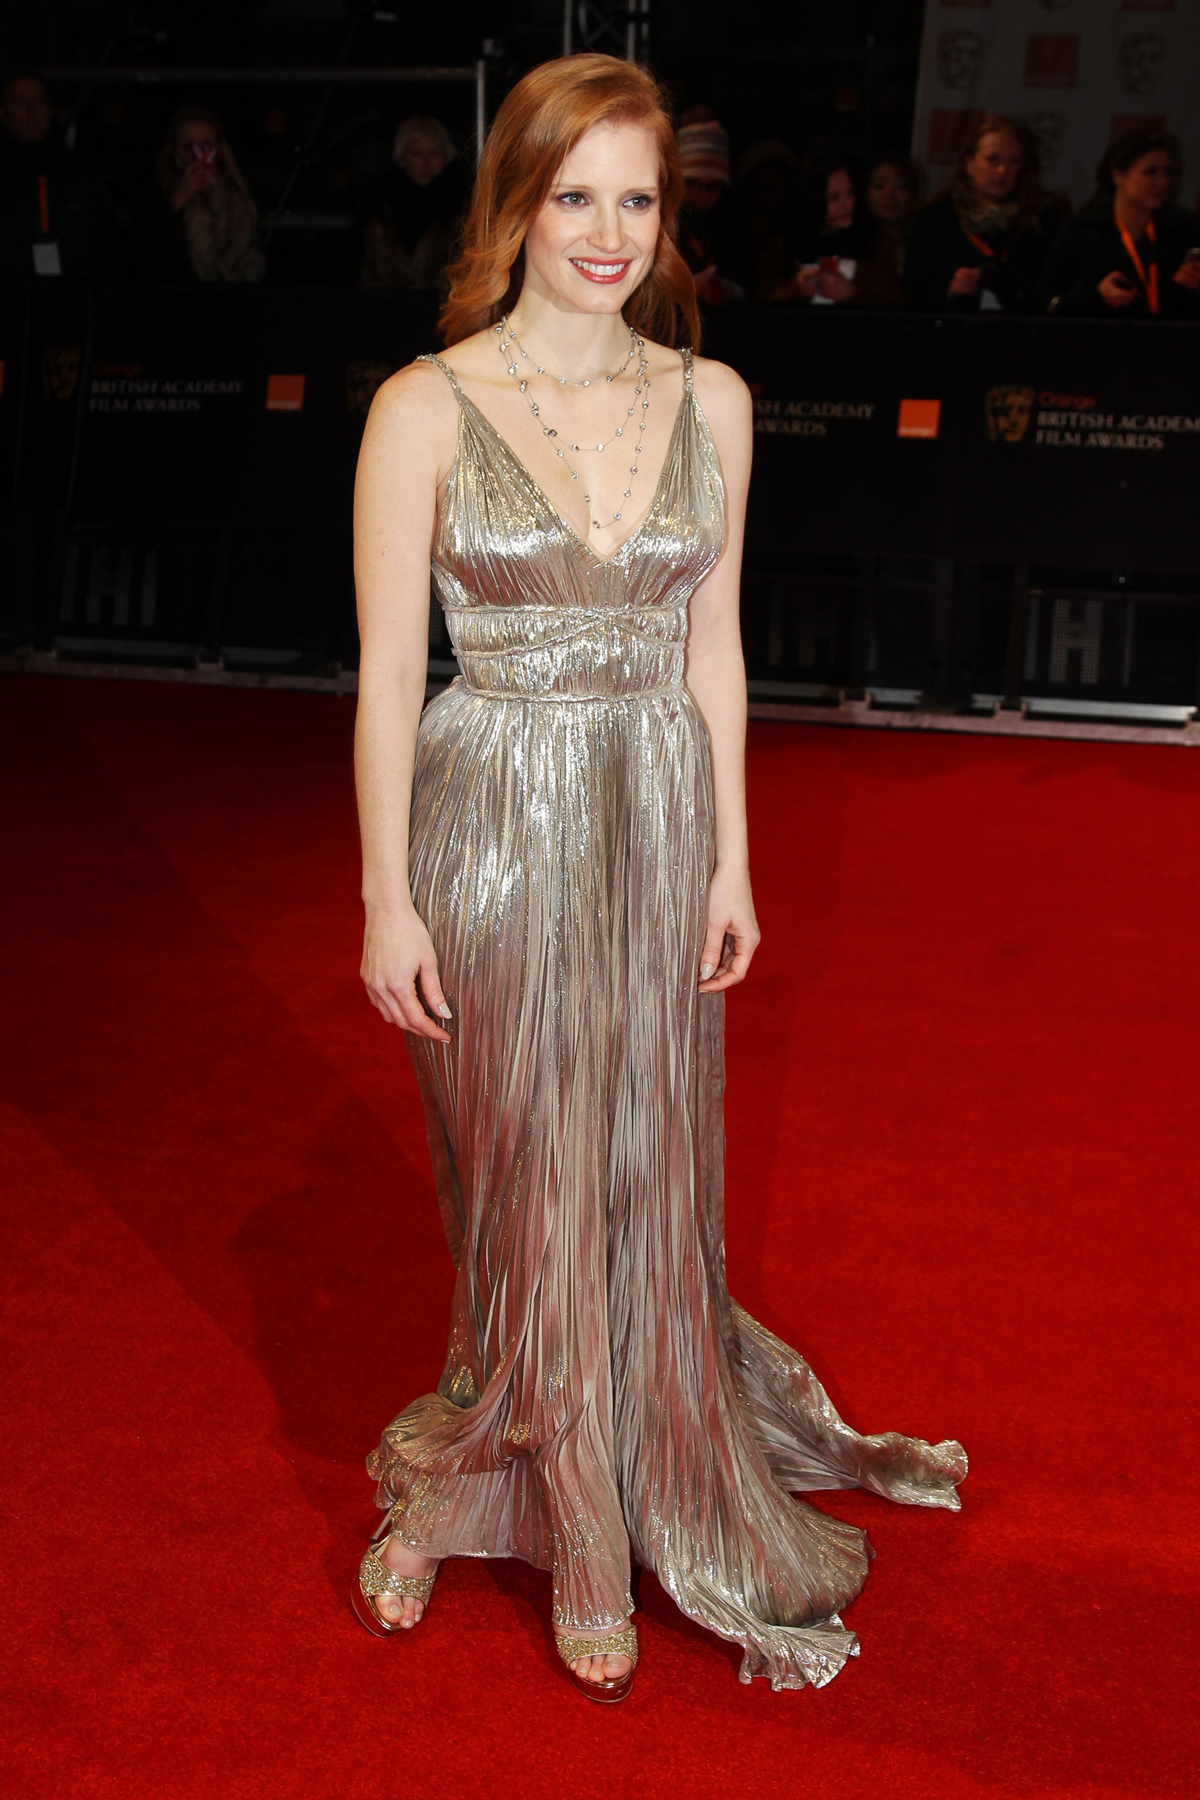 Jessica Chastain at BAFTA Awards 2012 in London Photo 1200x1800